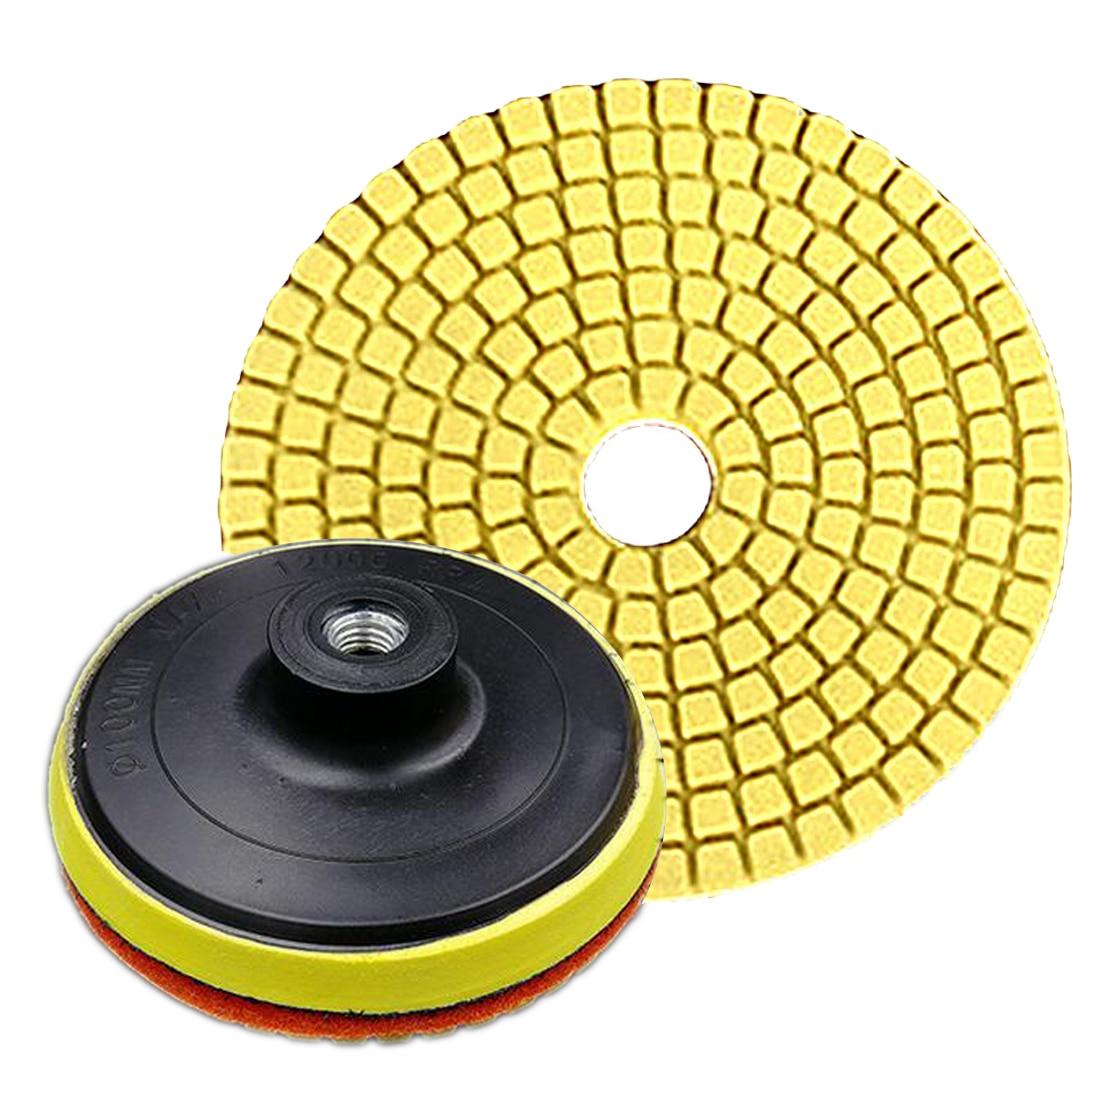 Grinding Machine Diamond Polishing Pads 4 inch 100mm Wet/Dry for Granite Stone Concrete Marble Sanding Use Flexible Accessories недорого